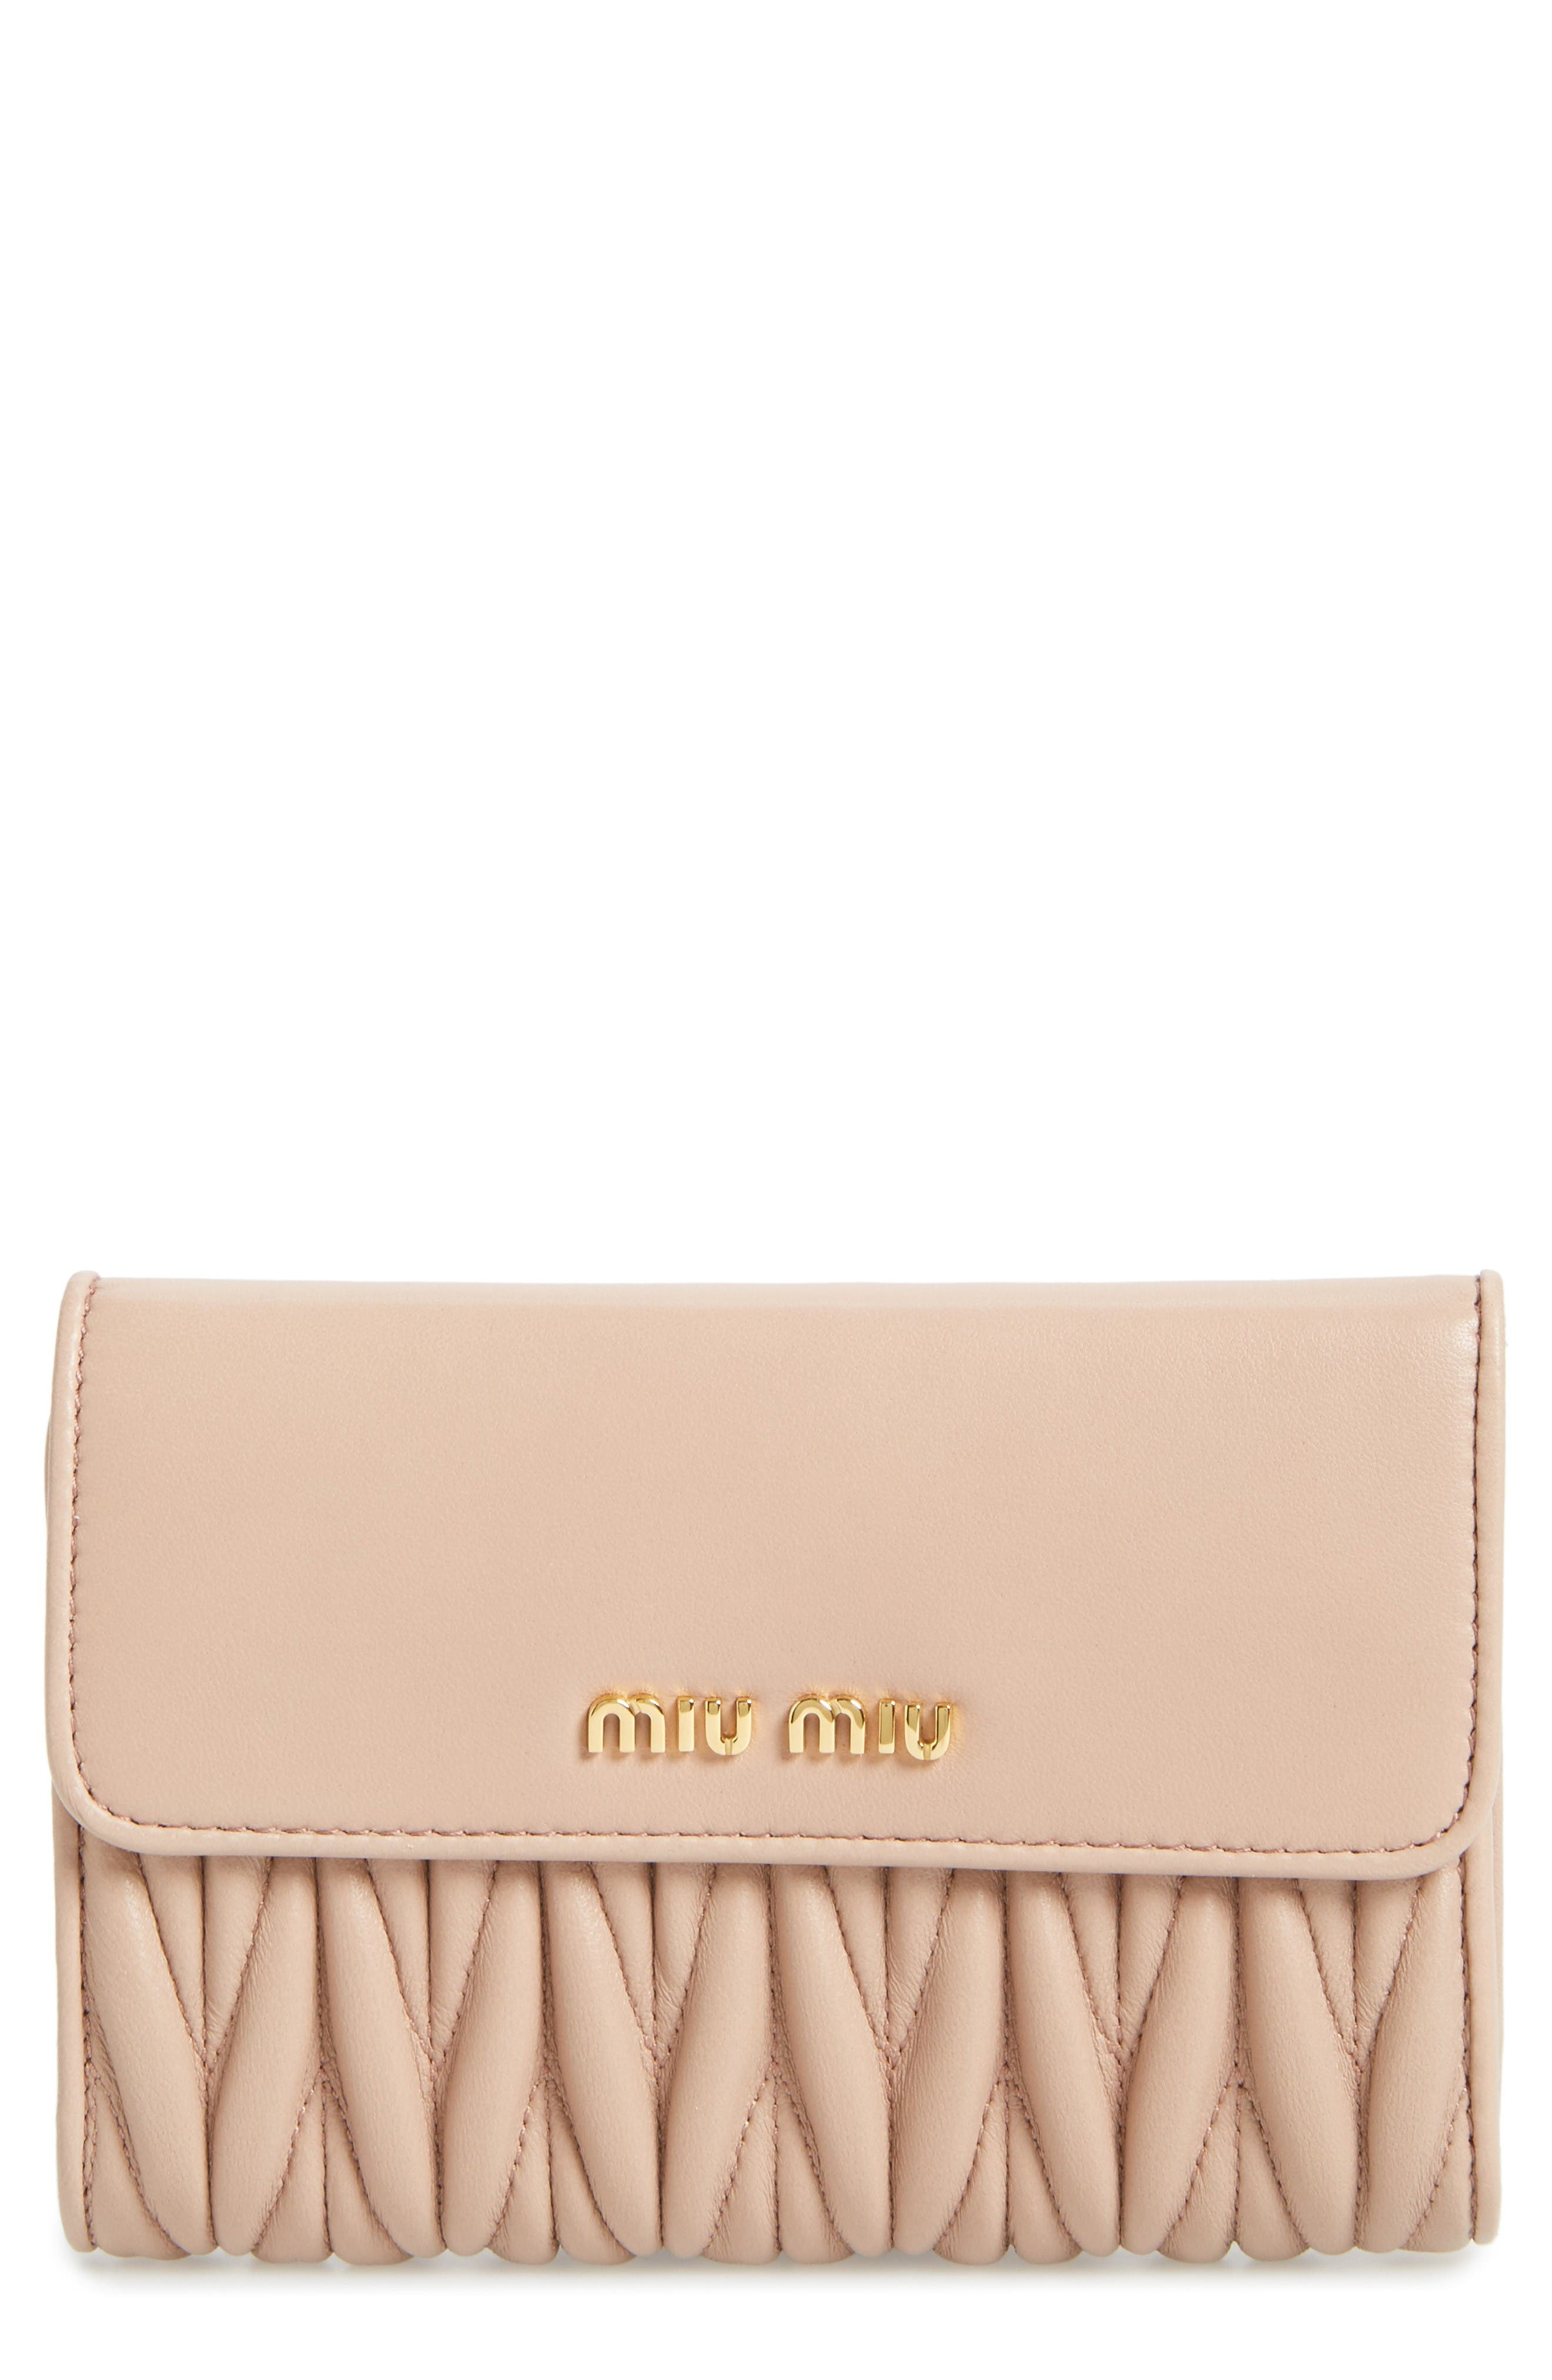 Alternate Image 1 Selected - Miu Miu Matelassé Leather French Wallet